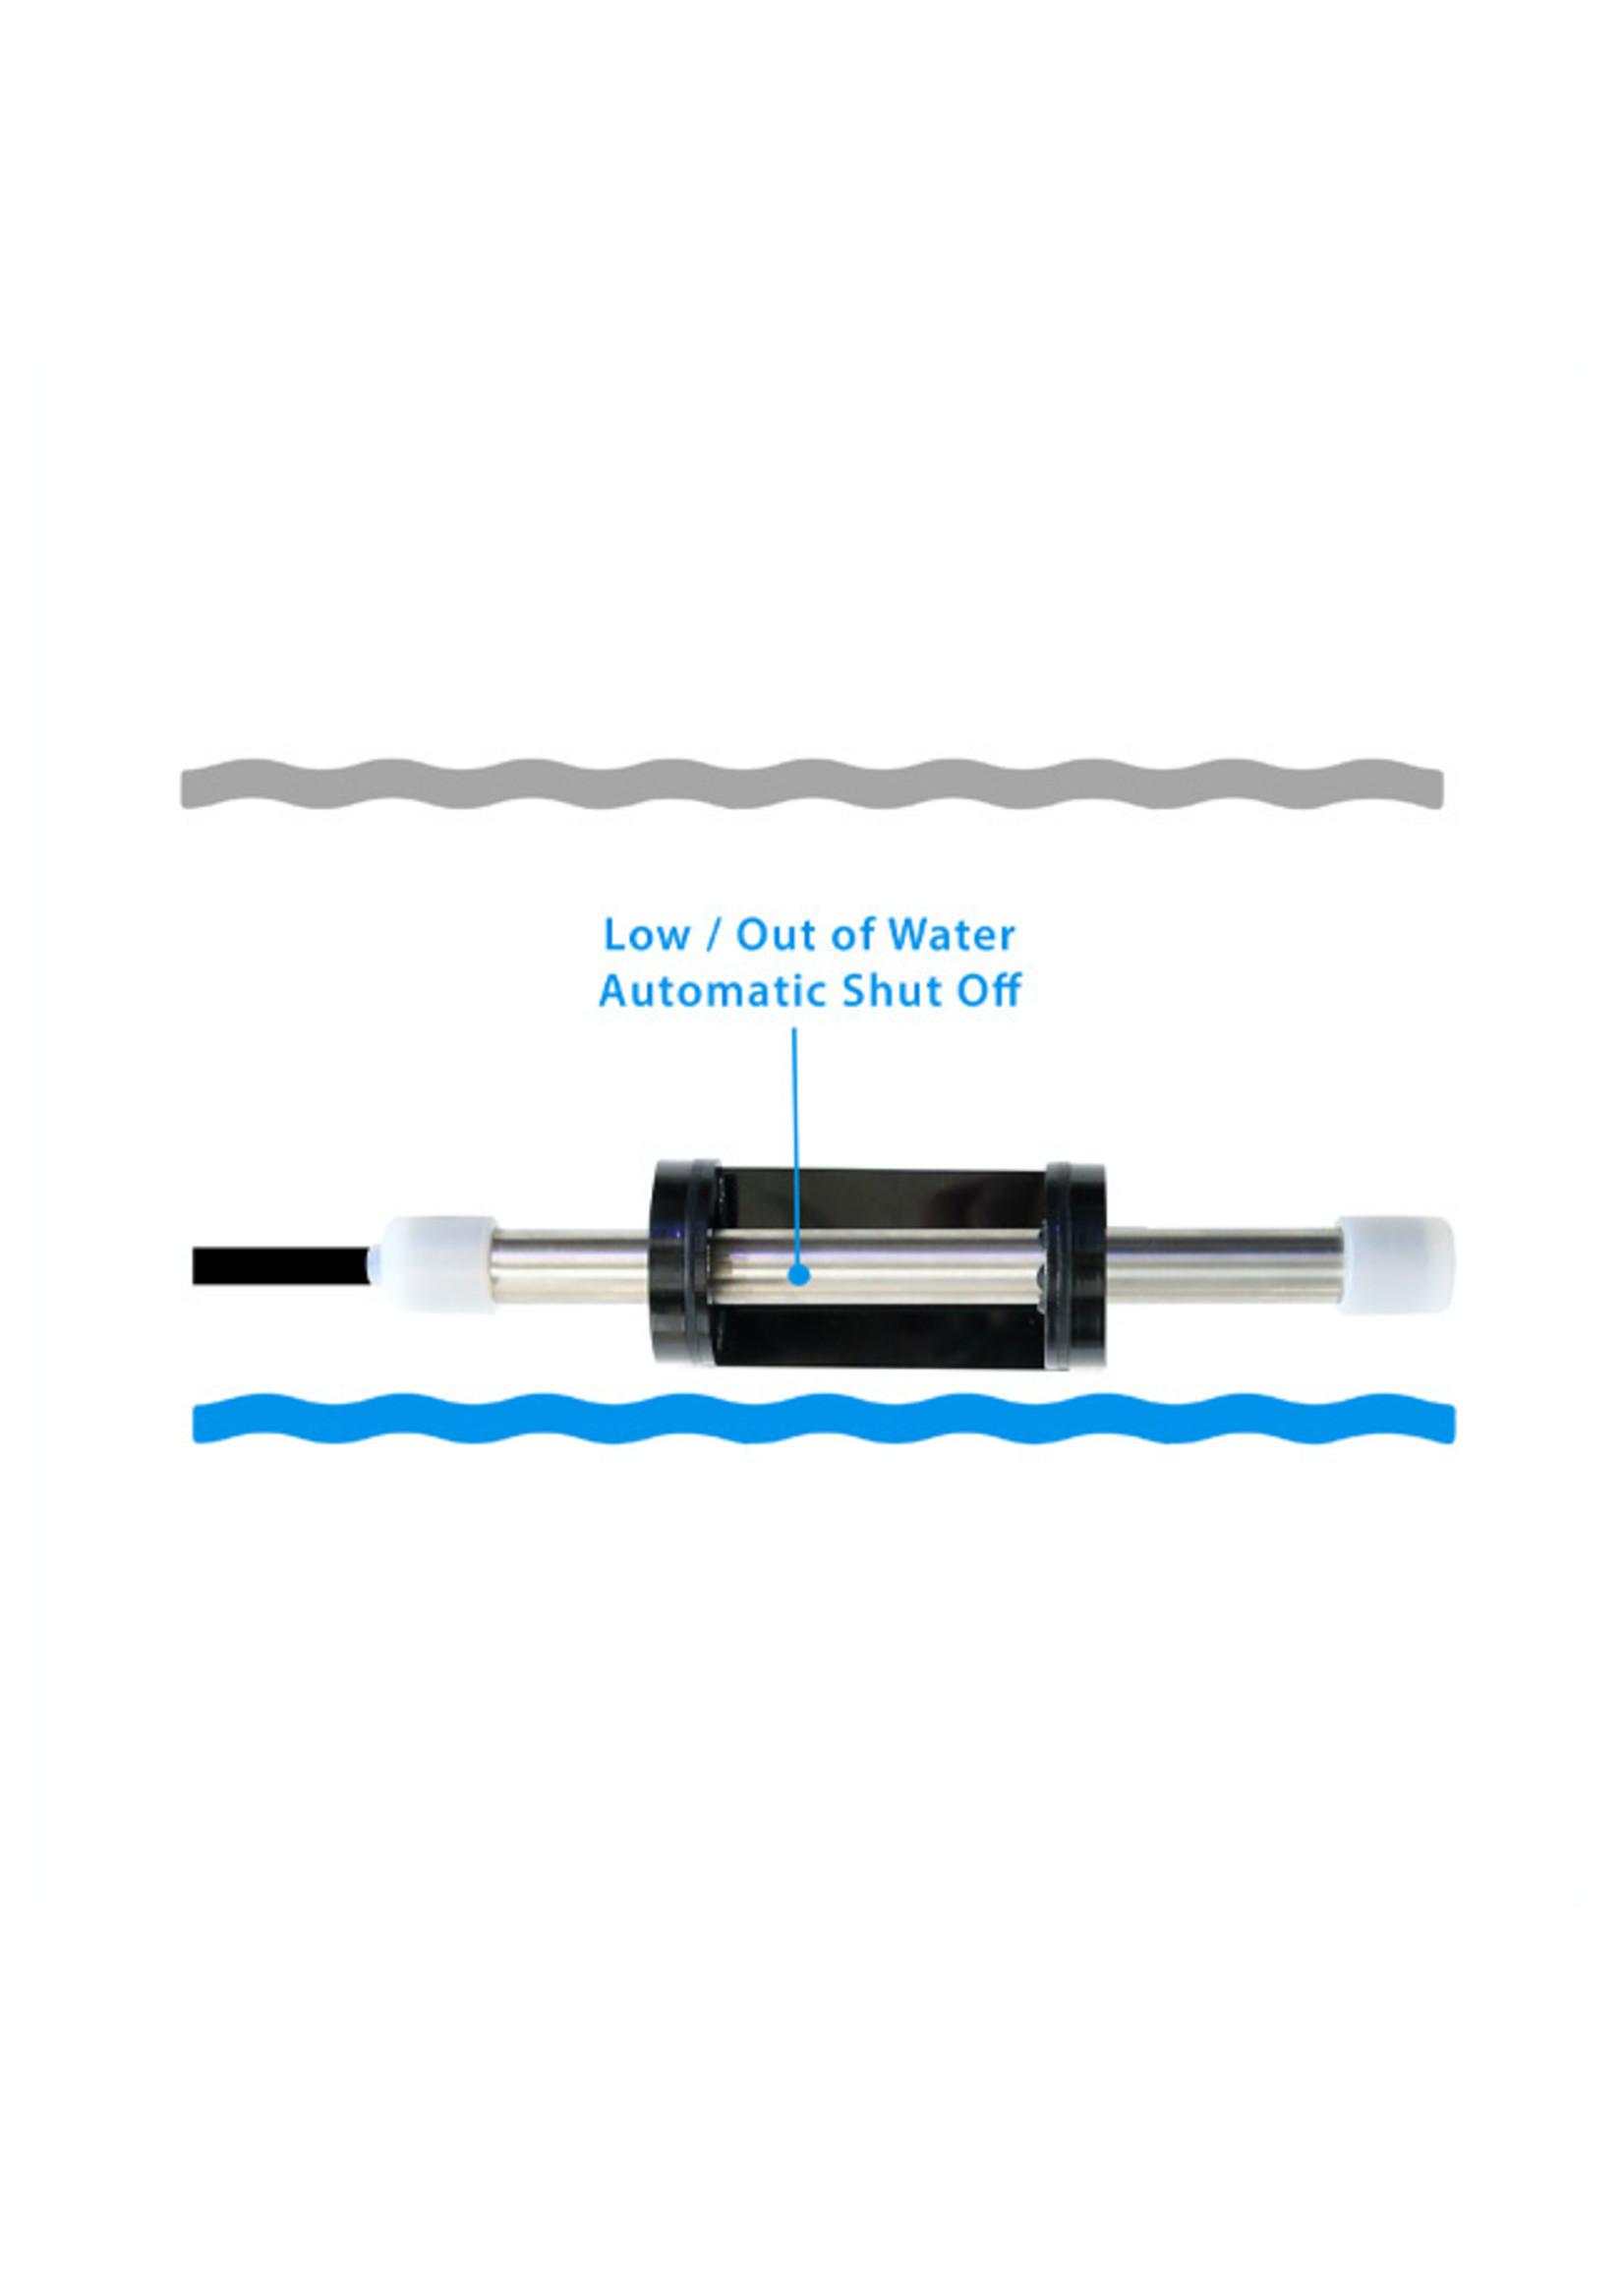 Innovative Marine Innovative Marine Helio PTC Smart Heater